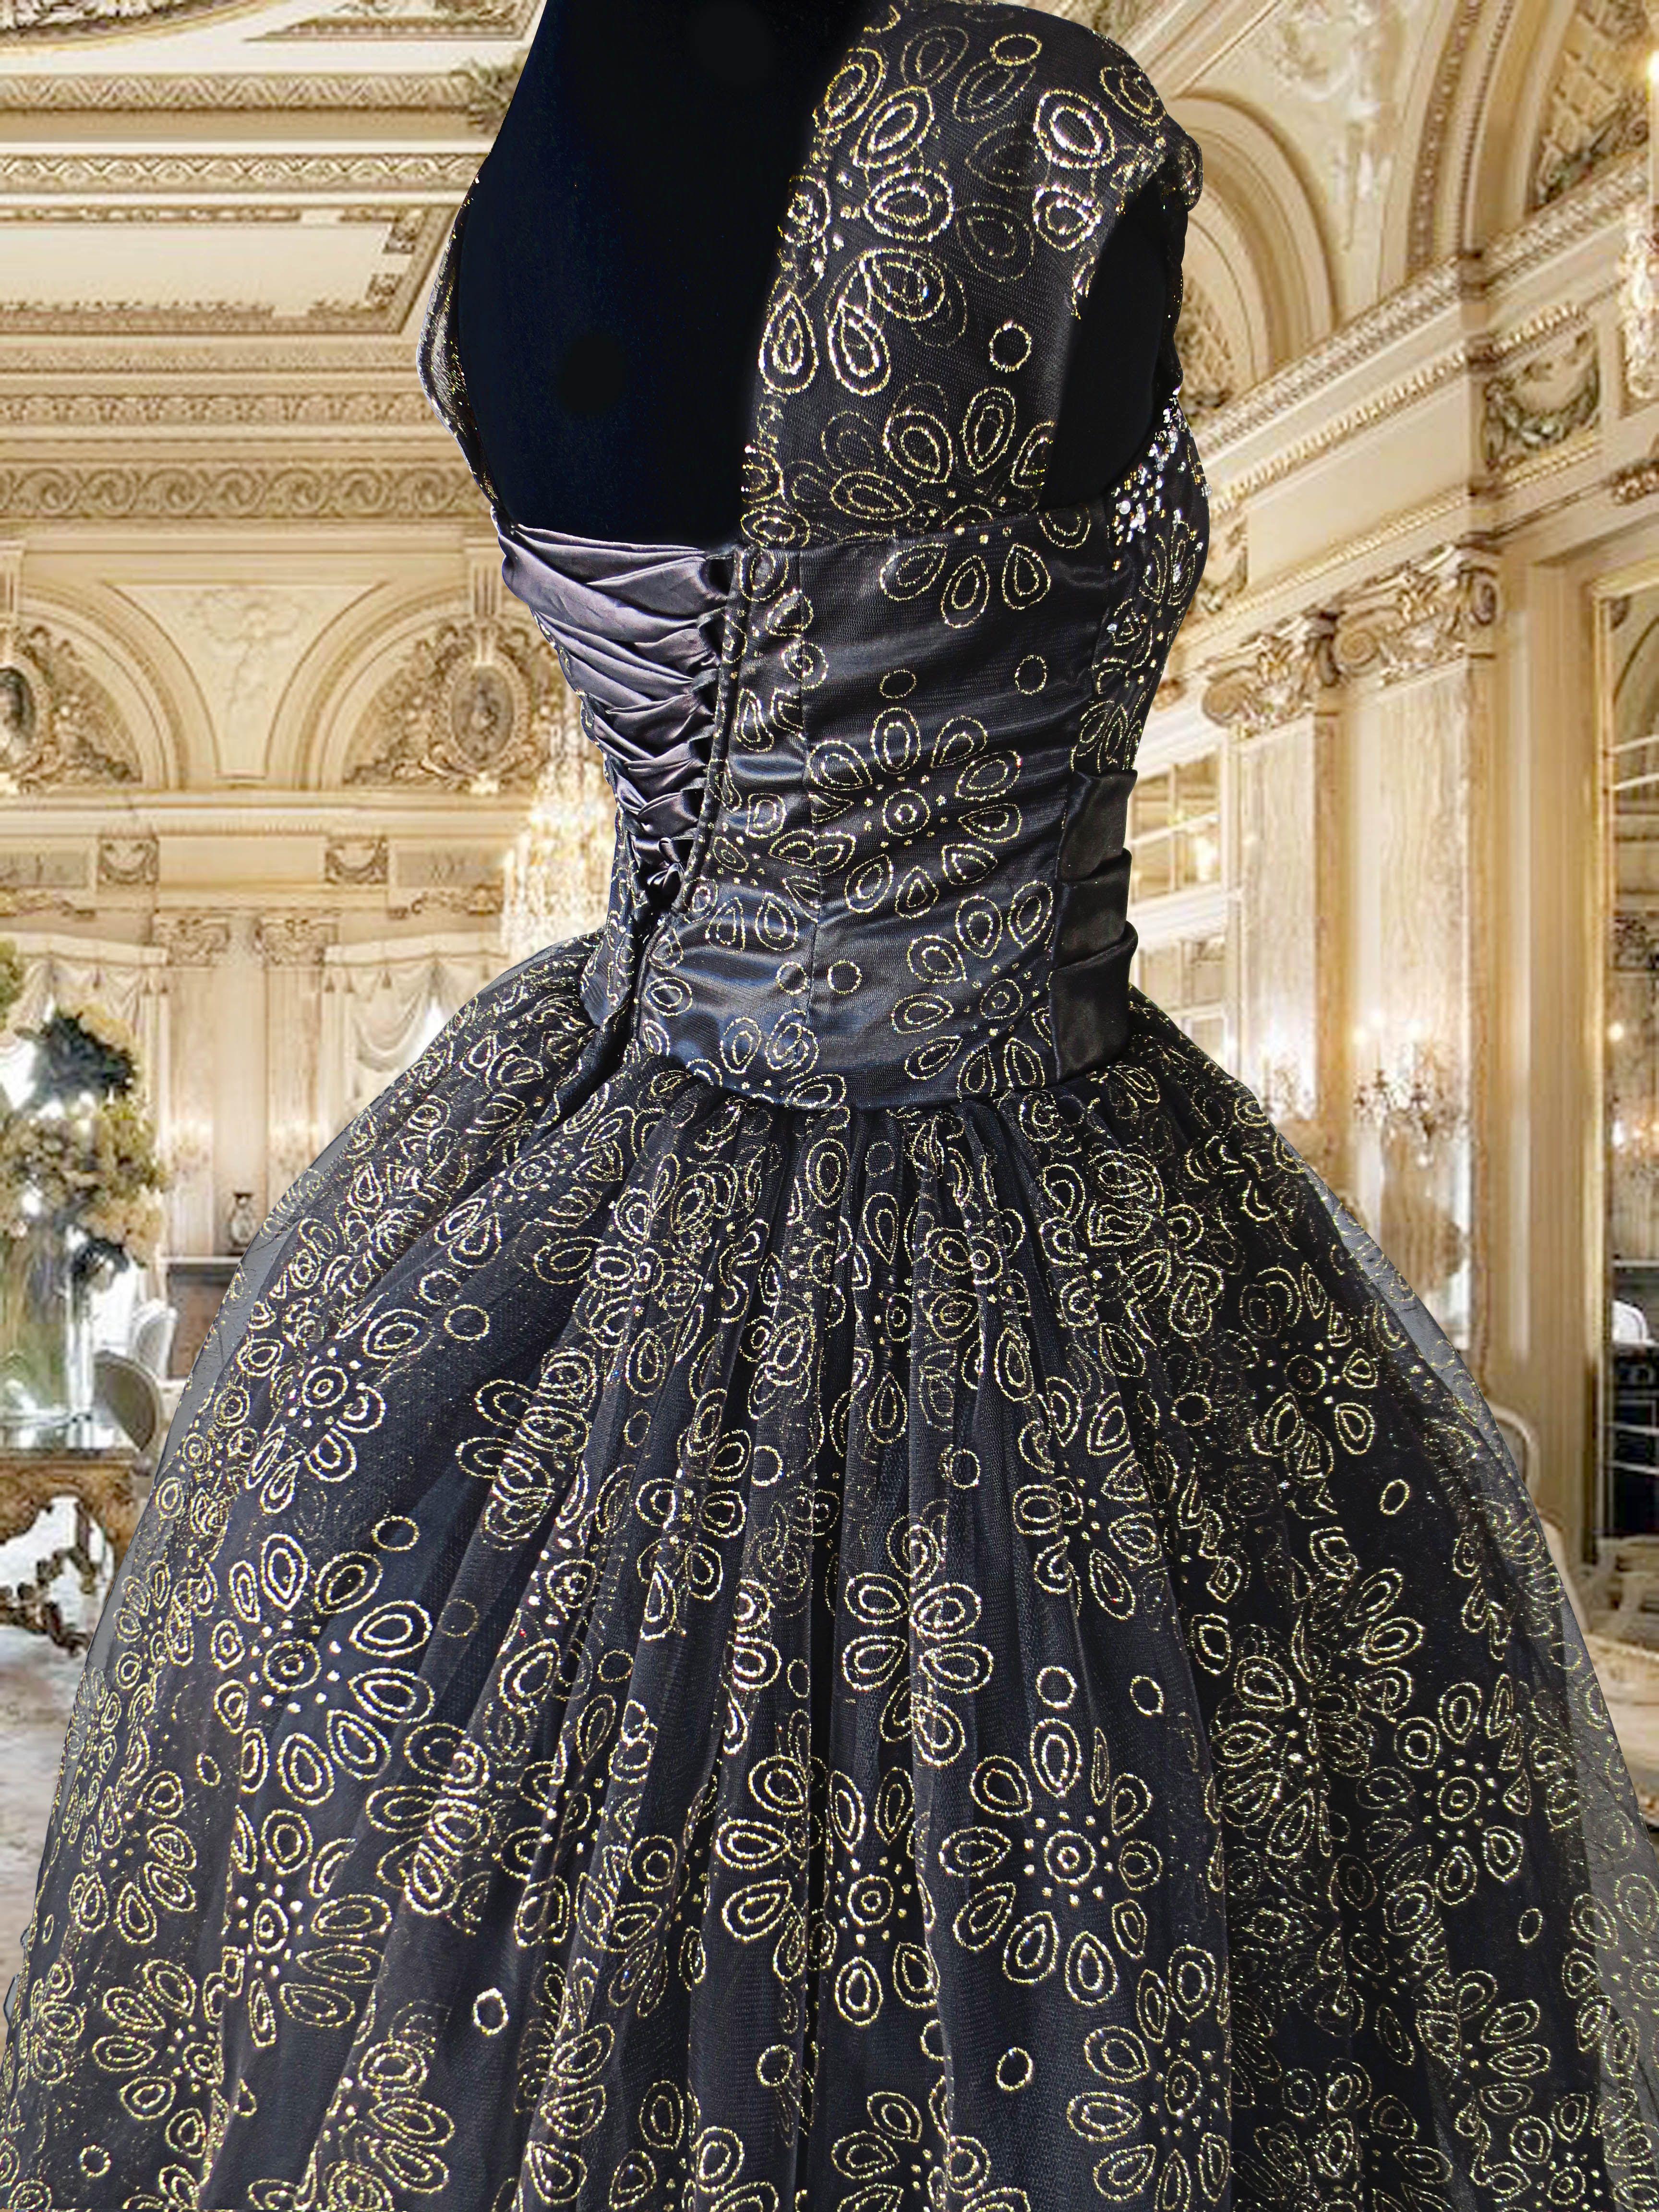 Ball Gown Rentals